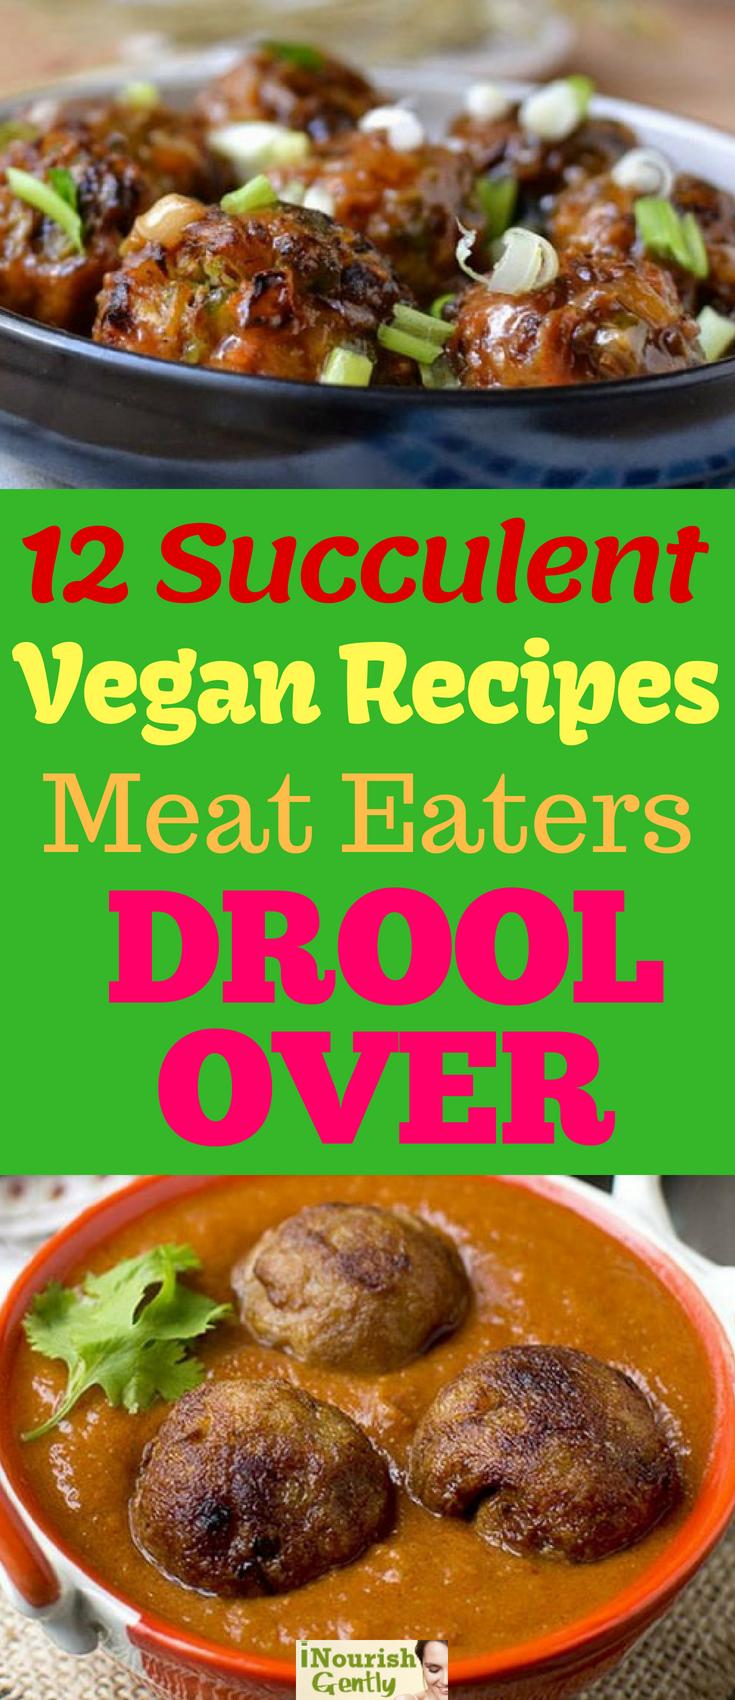 Mouthwatering Vegan Recipes Even Meat Eaters Will Truly Appreciate Vegan Veganized Meaty Vegetarian Nutrition Vegan Recipes Vegetarian Cooking